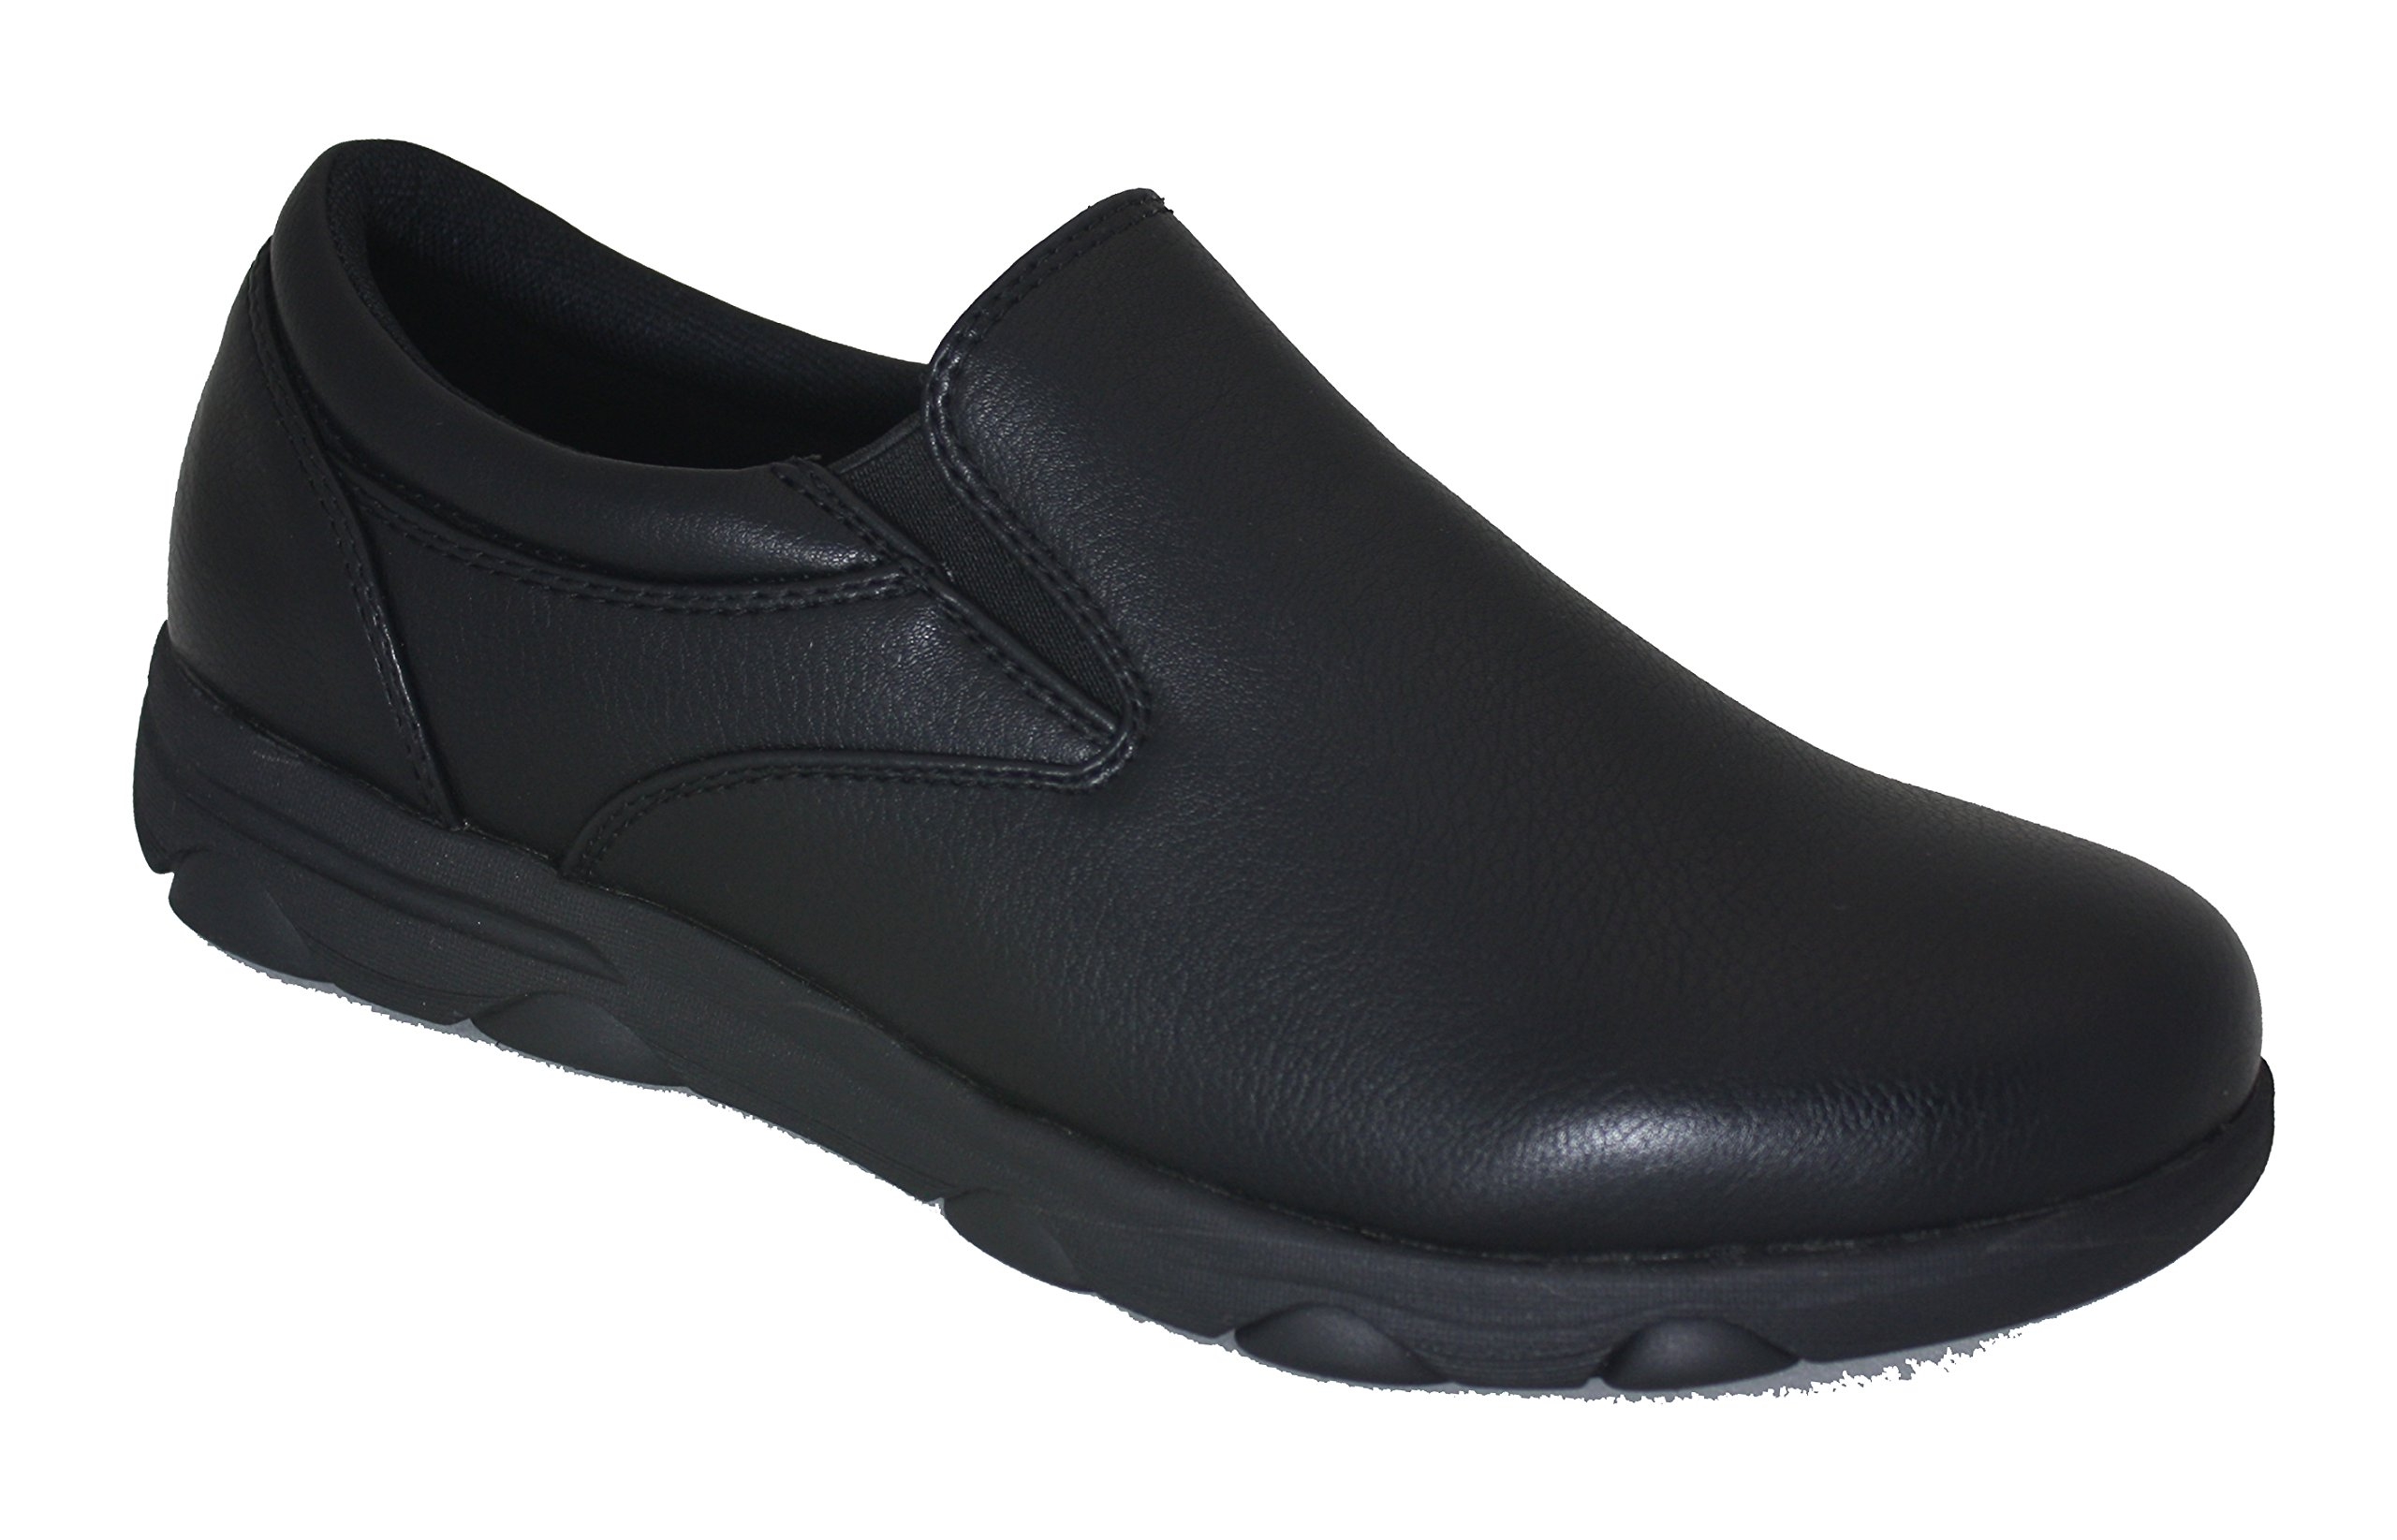 Gelato Mens 8556 Non-Slip Professional Slip on Comfort Work Shoe with Memory Insole (9.5, Black) by Gelato